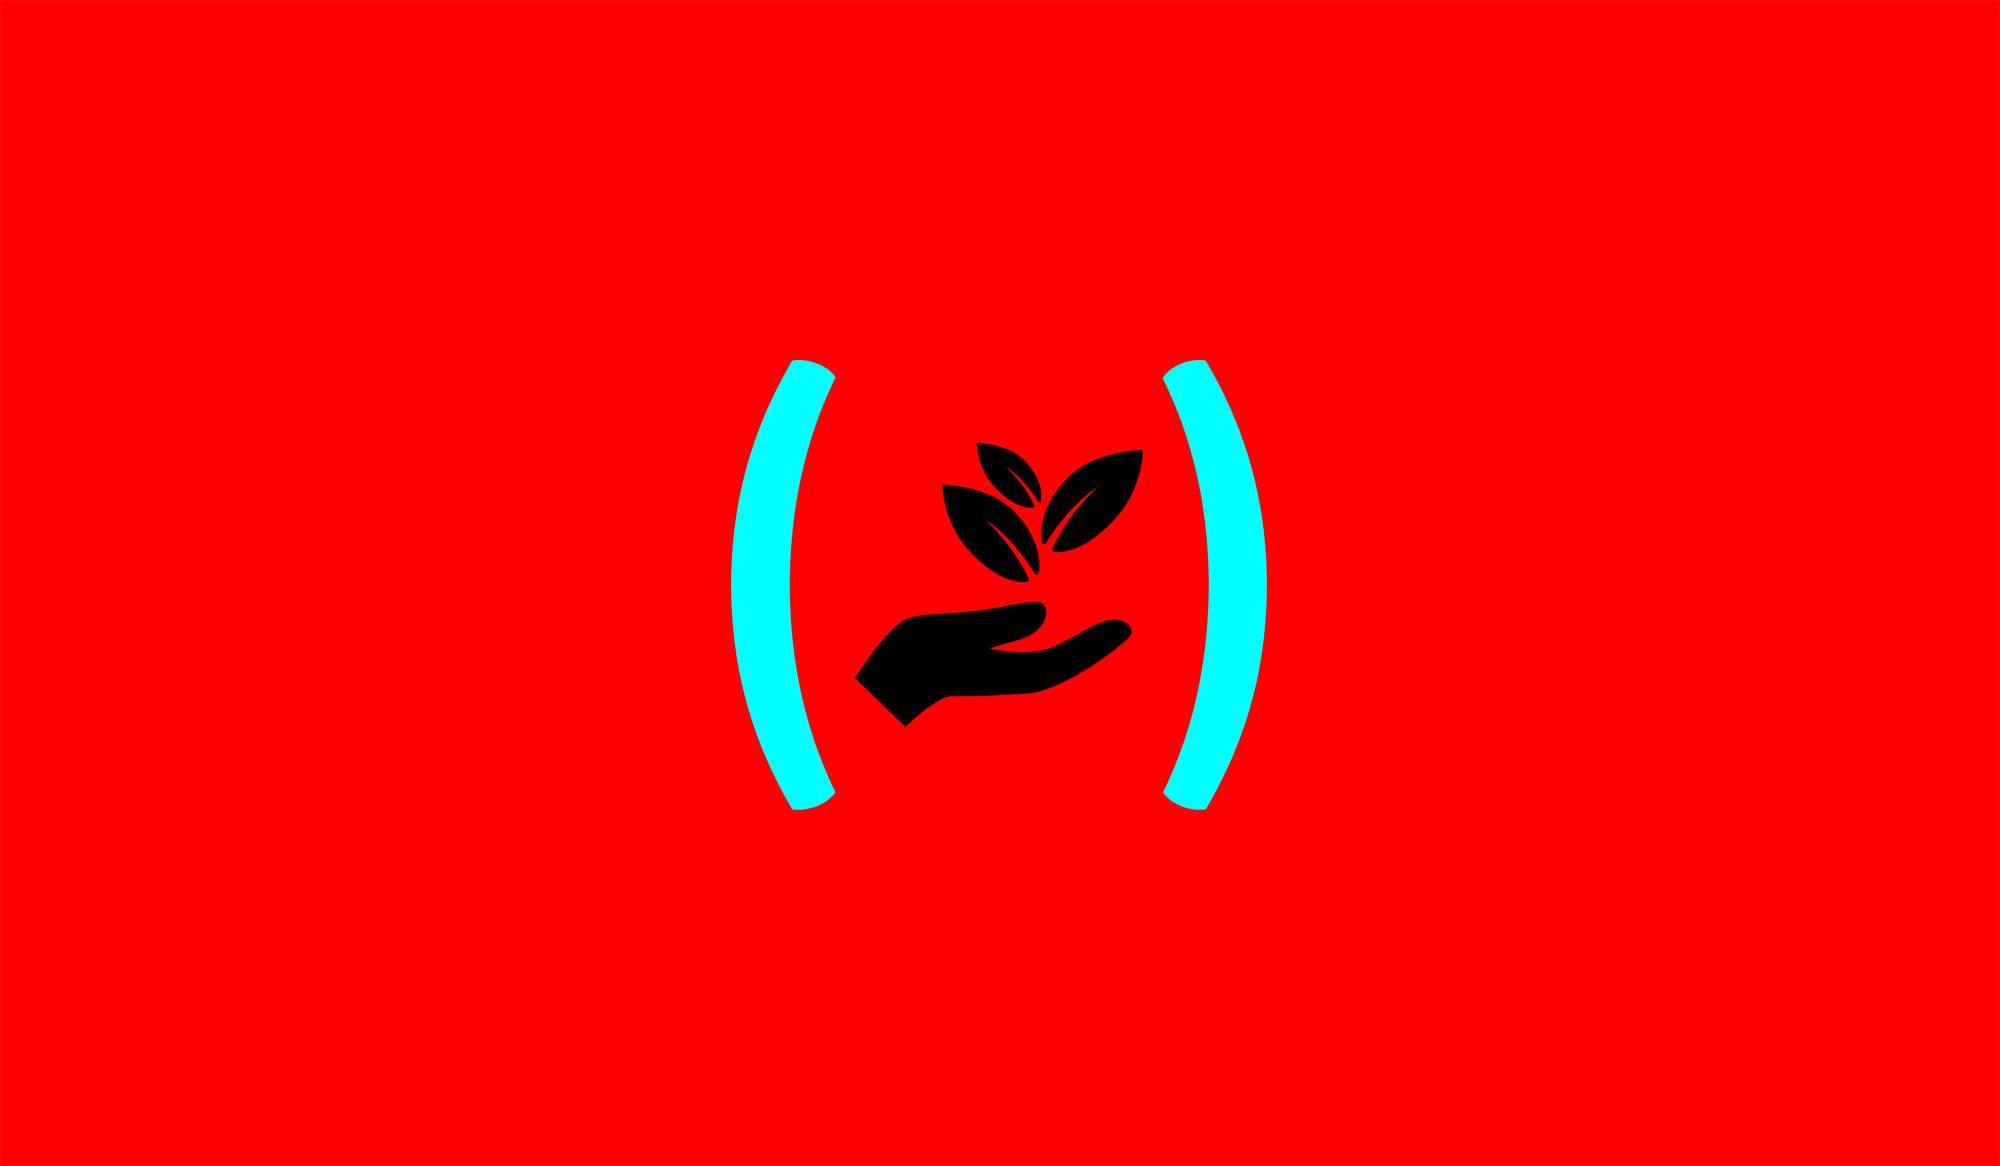 quentin_paquignon-branding-visual_identity-musi(x)™_05.png